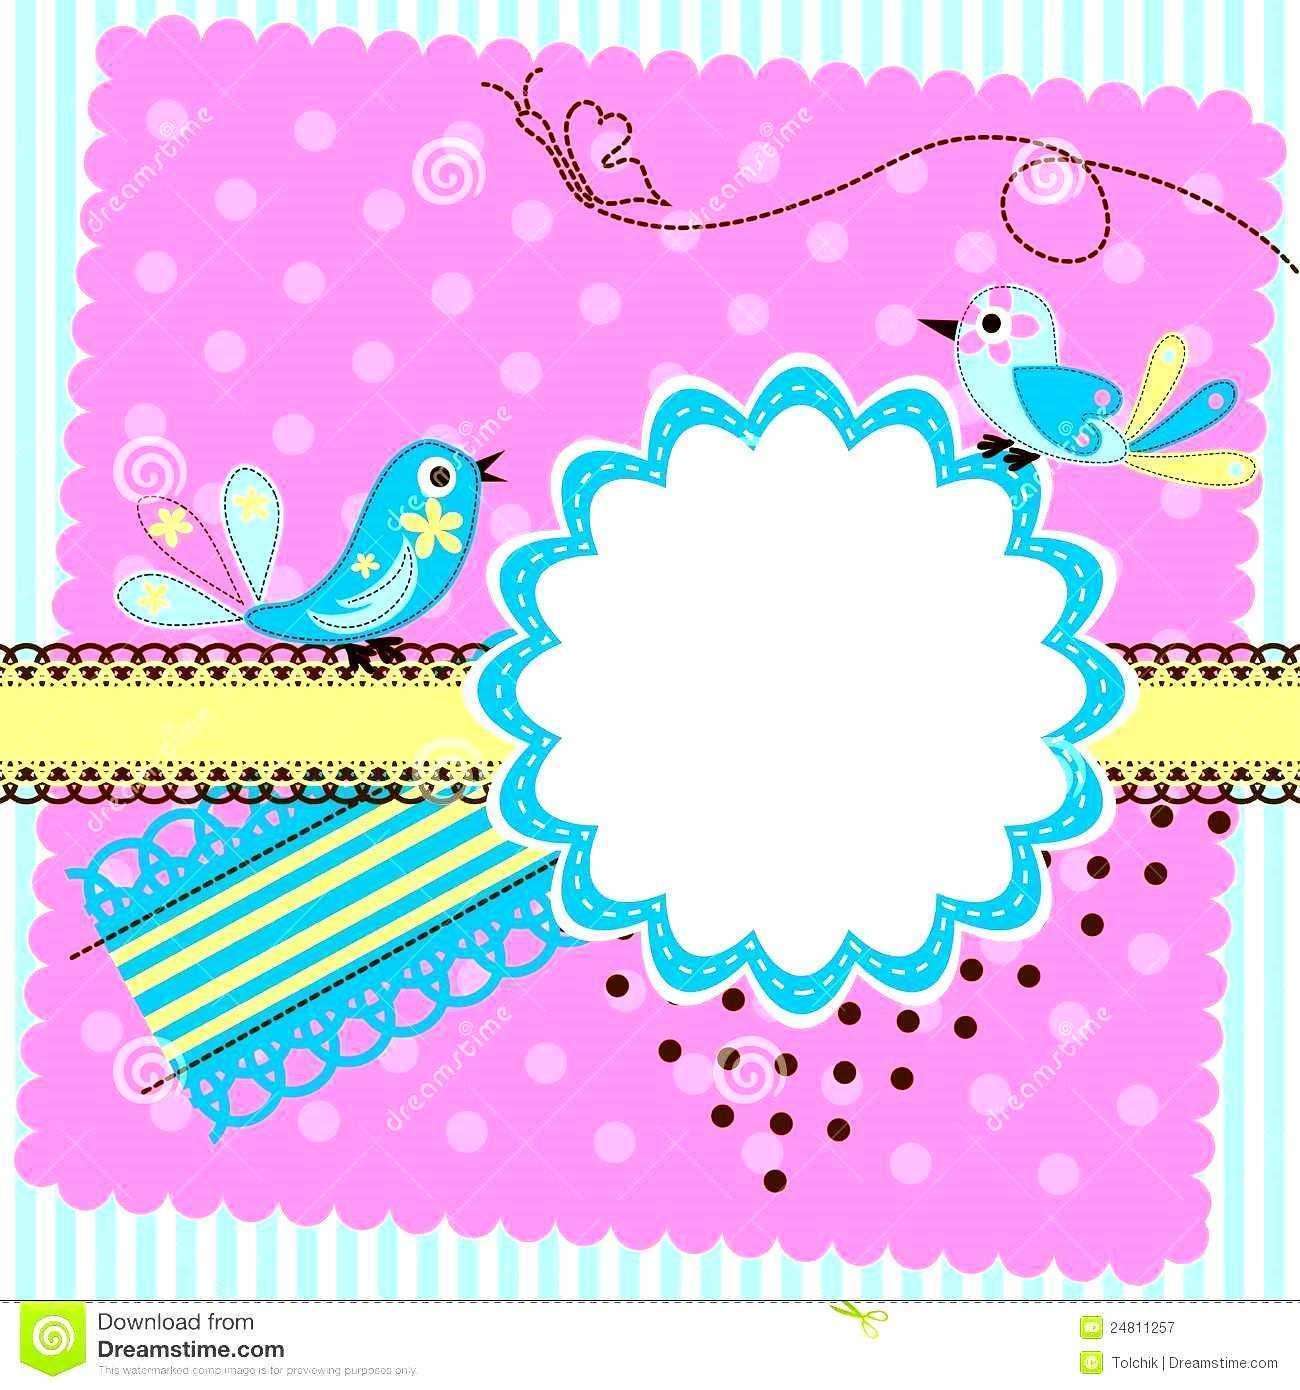 blank birthday card template microsoft word  cards design